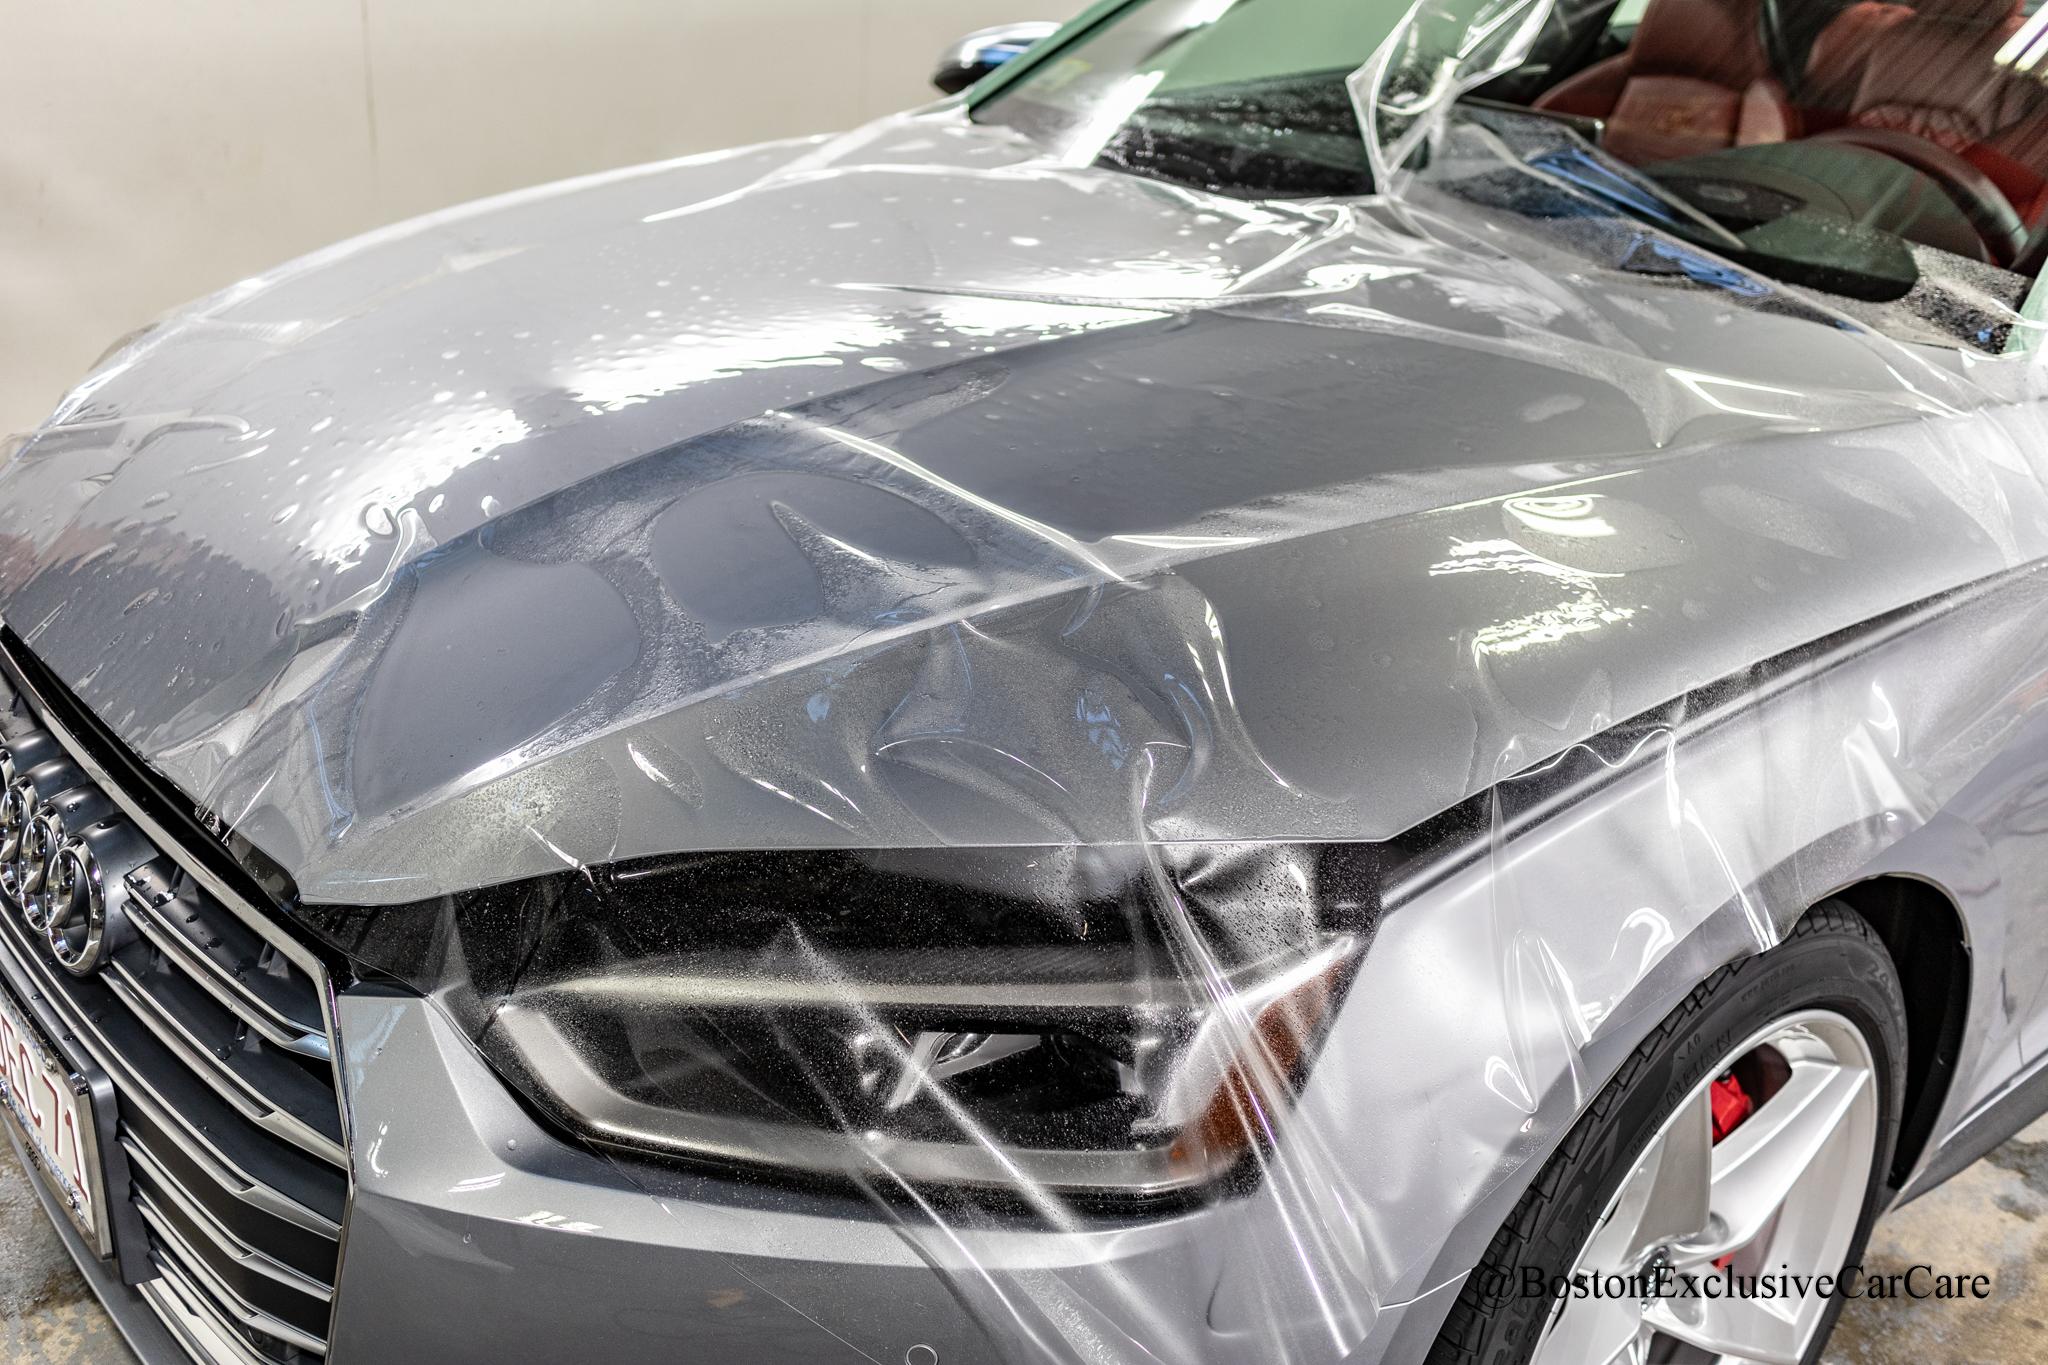 2019 Audi S5 - Xpel full nose with Opti-Coat Pro Plus coating -